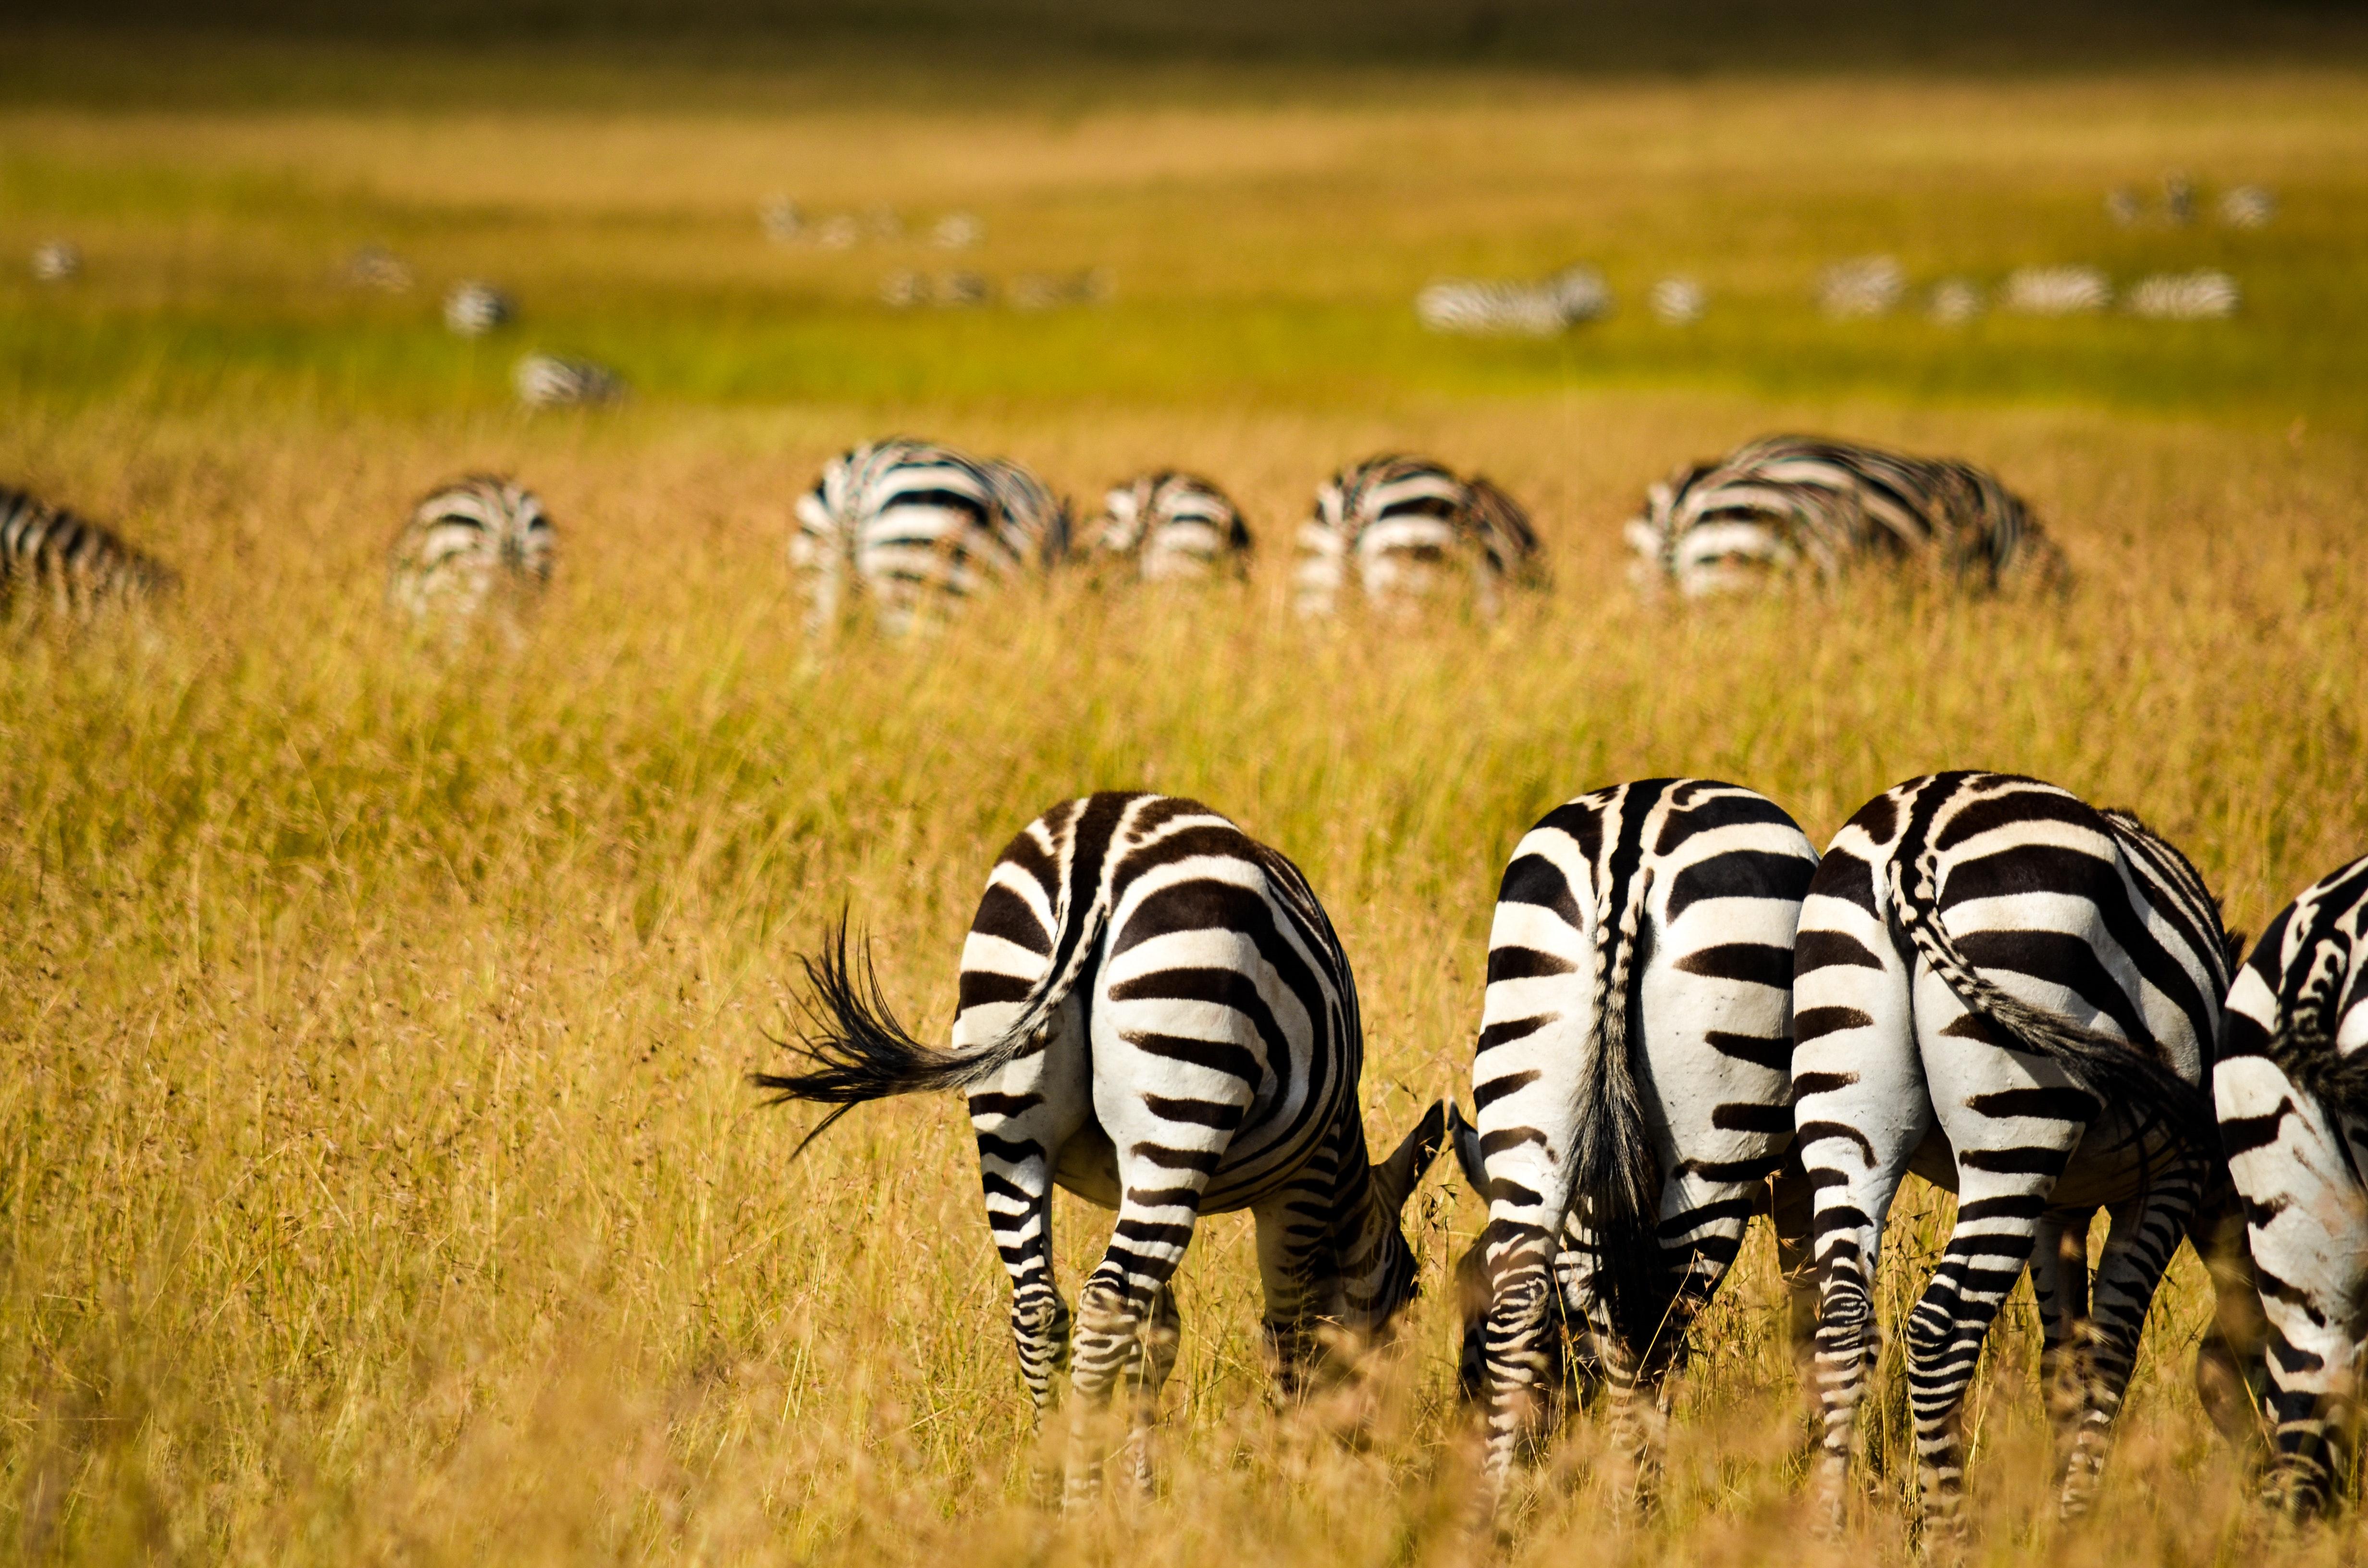 Zebras on field photo